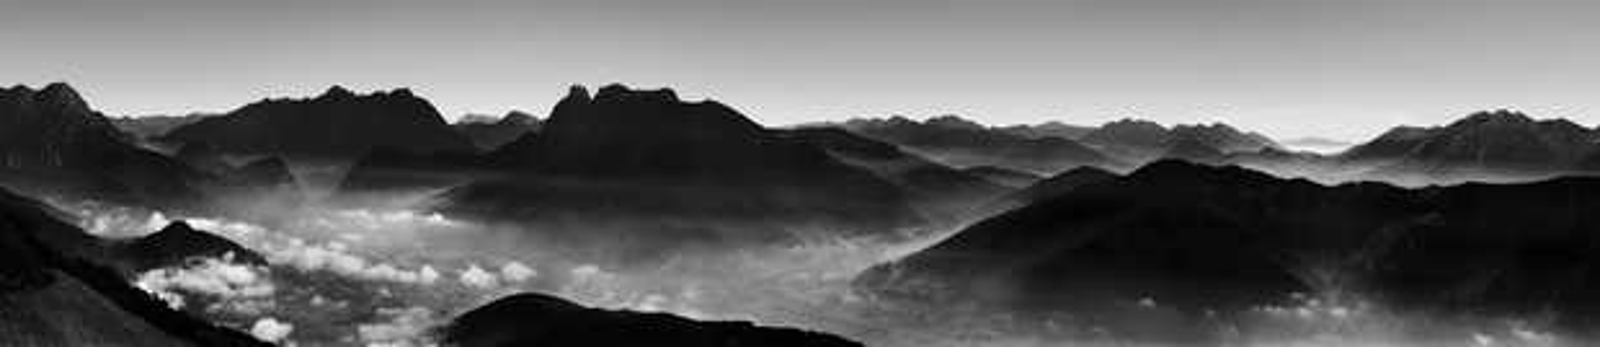 Ennstaler Alpen - Rudolf Rother